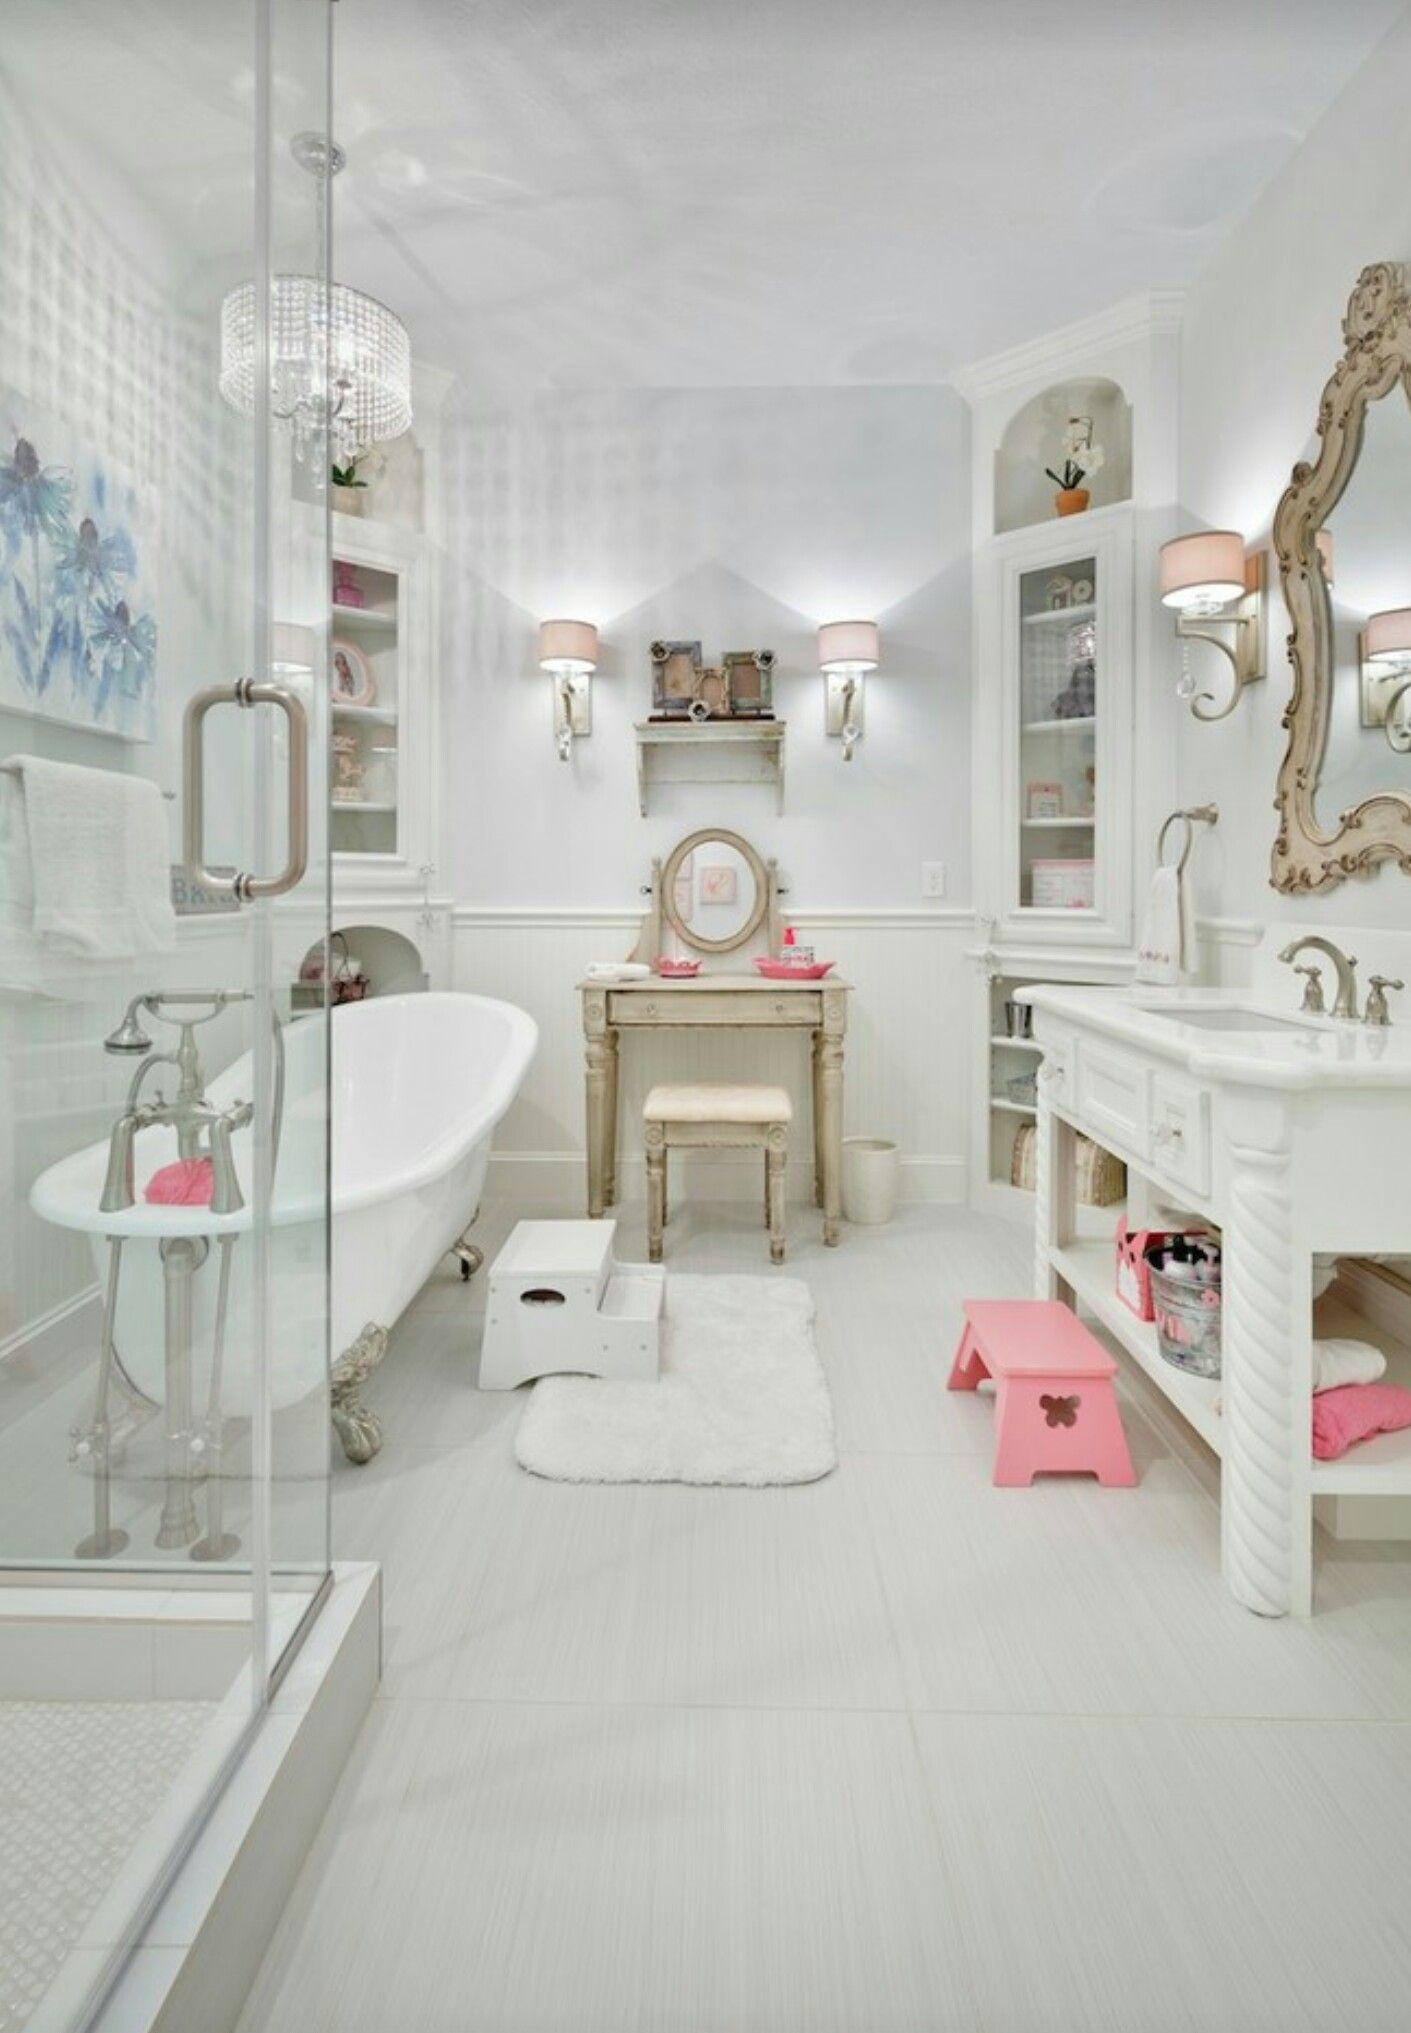 Pin by Bel Banho on kids bath | Pinterest | Vintage bathrooms and Bath